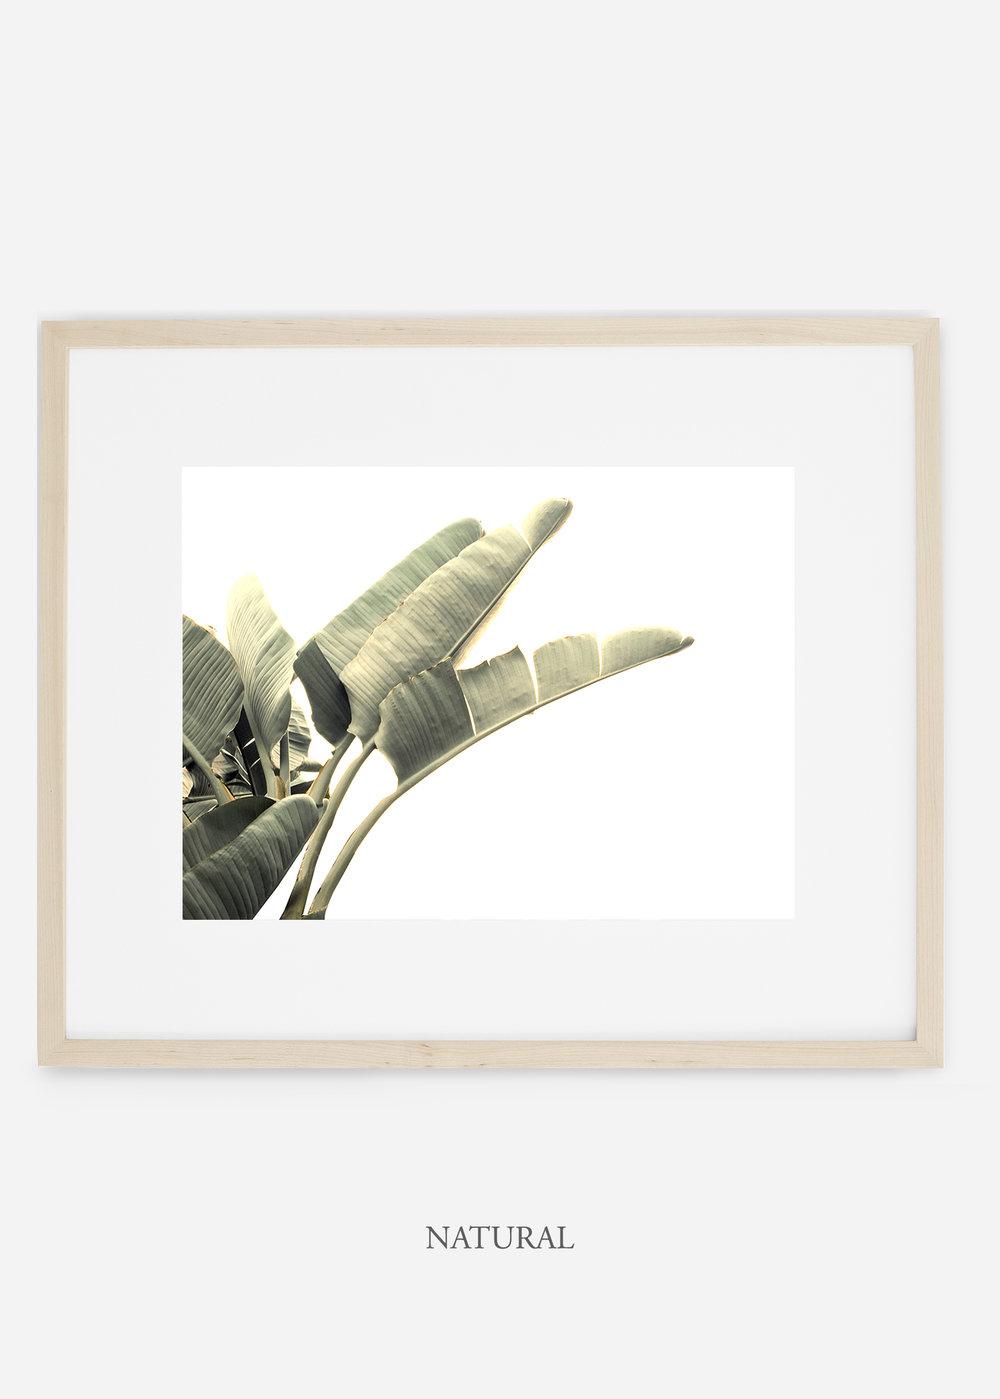 WilderCalifornia_interiordesign_art_naturalframe_BananaLeafNo.1_Mat.jpg